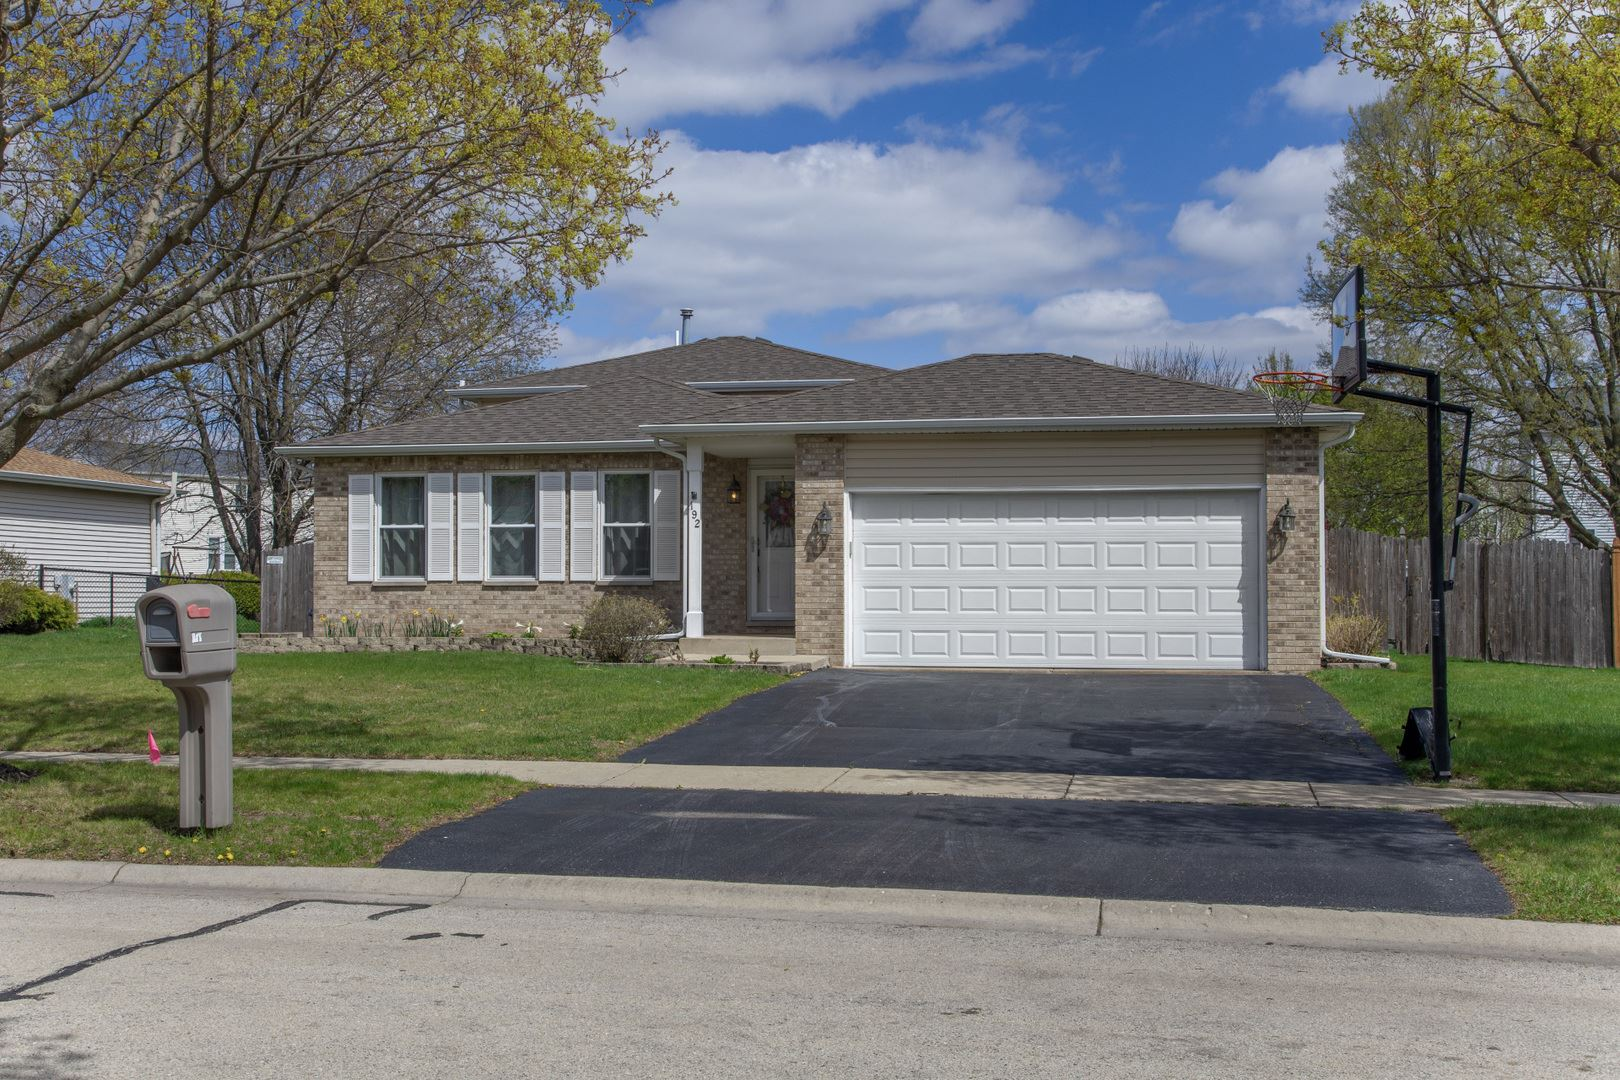 Photo of 192 Chestnut Lane, Bolingbrook, IL 60490 (MLS # 11055750)